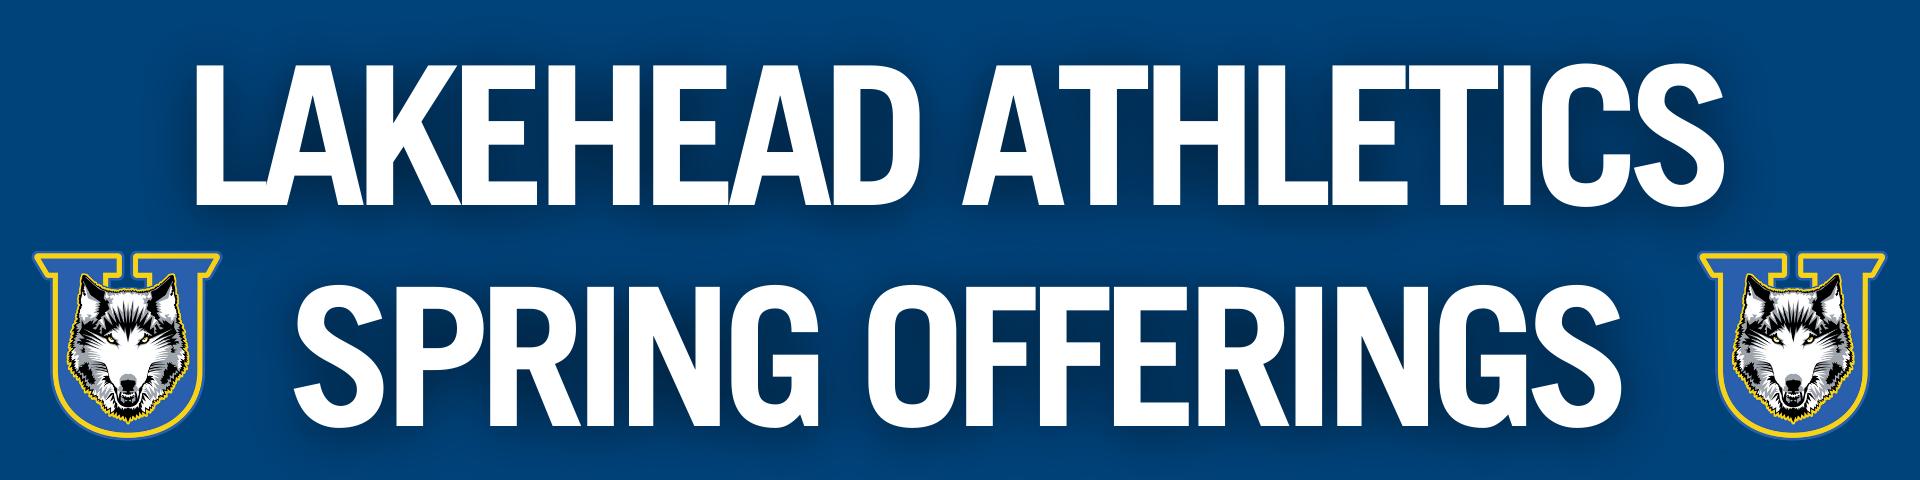 Lakehead Athletics Spring Offerings